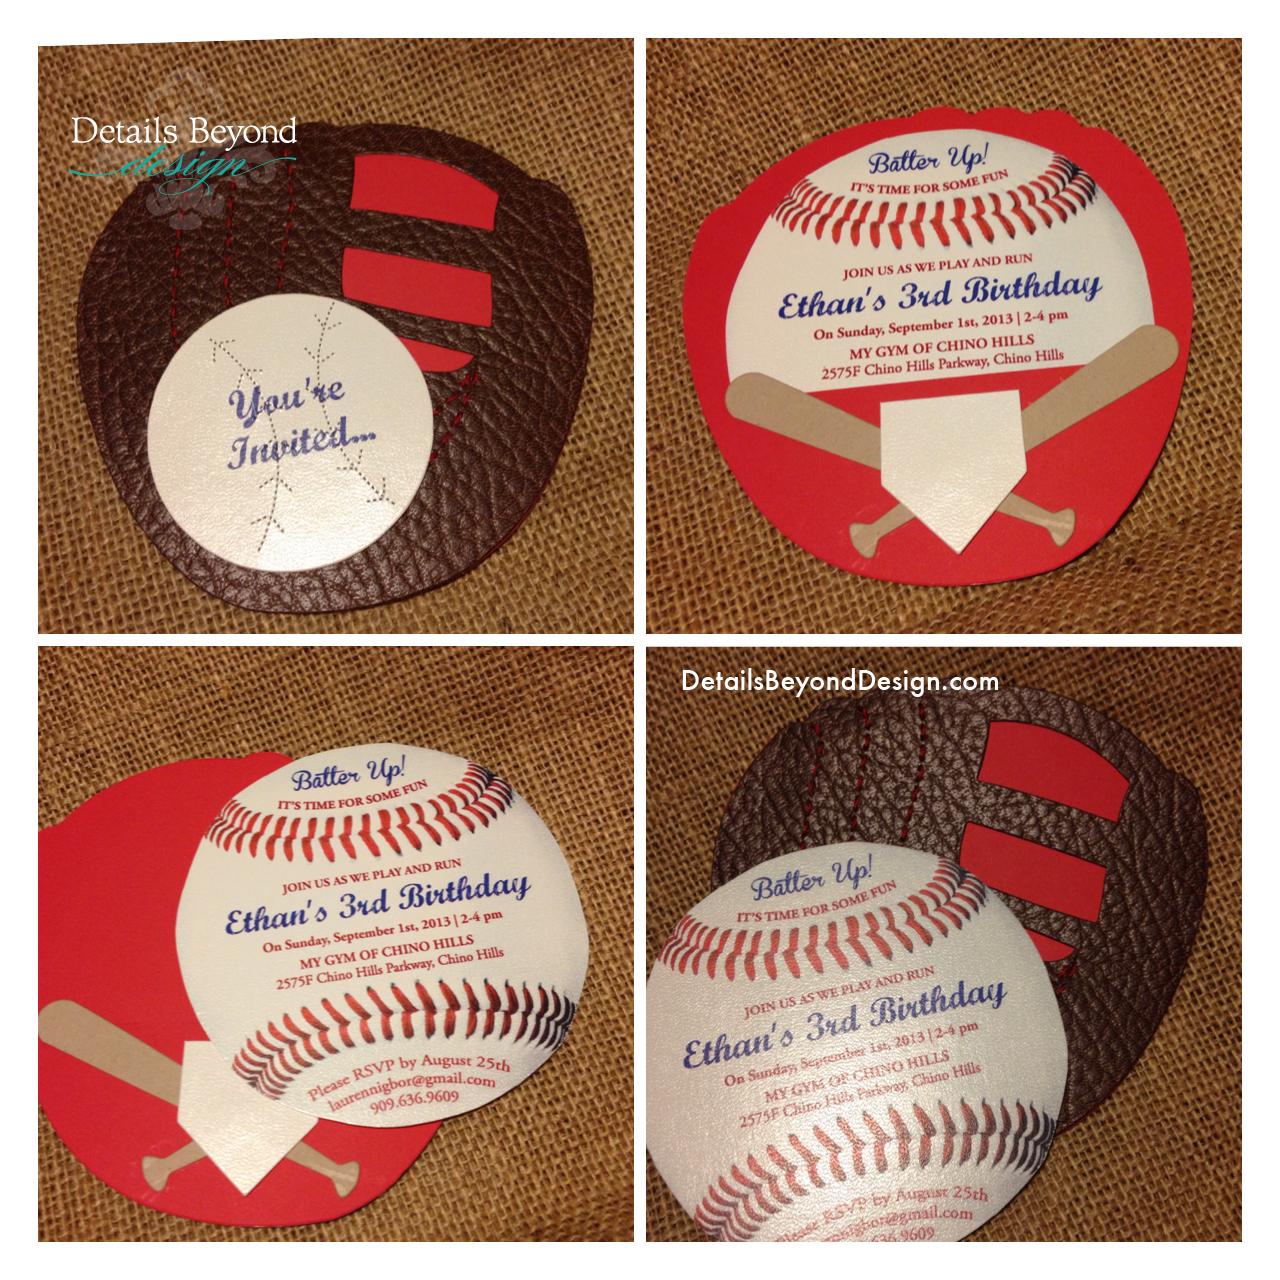 Details Beyond Design By Lauren Baseball Birthday Invitation